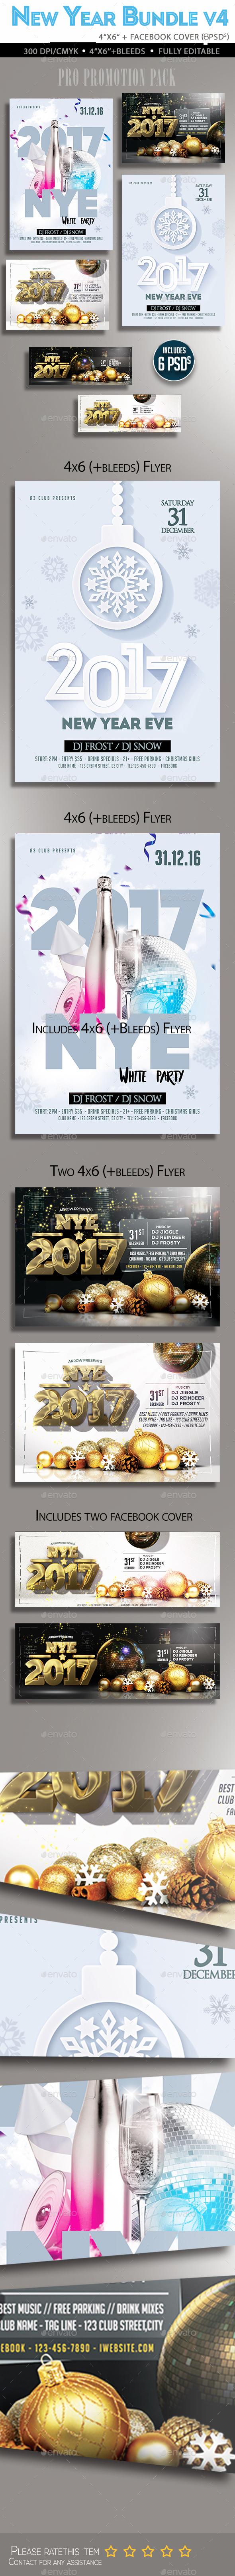 New Year Flyer Bundle V4